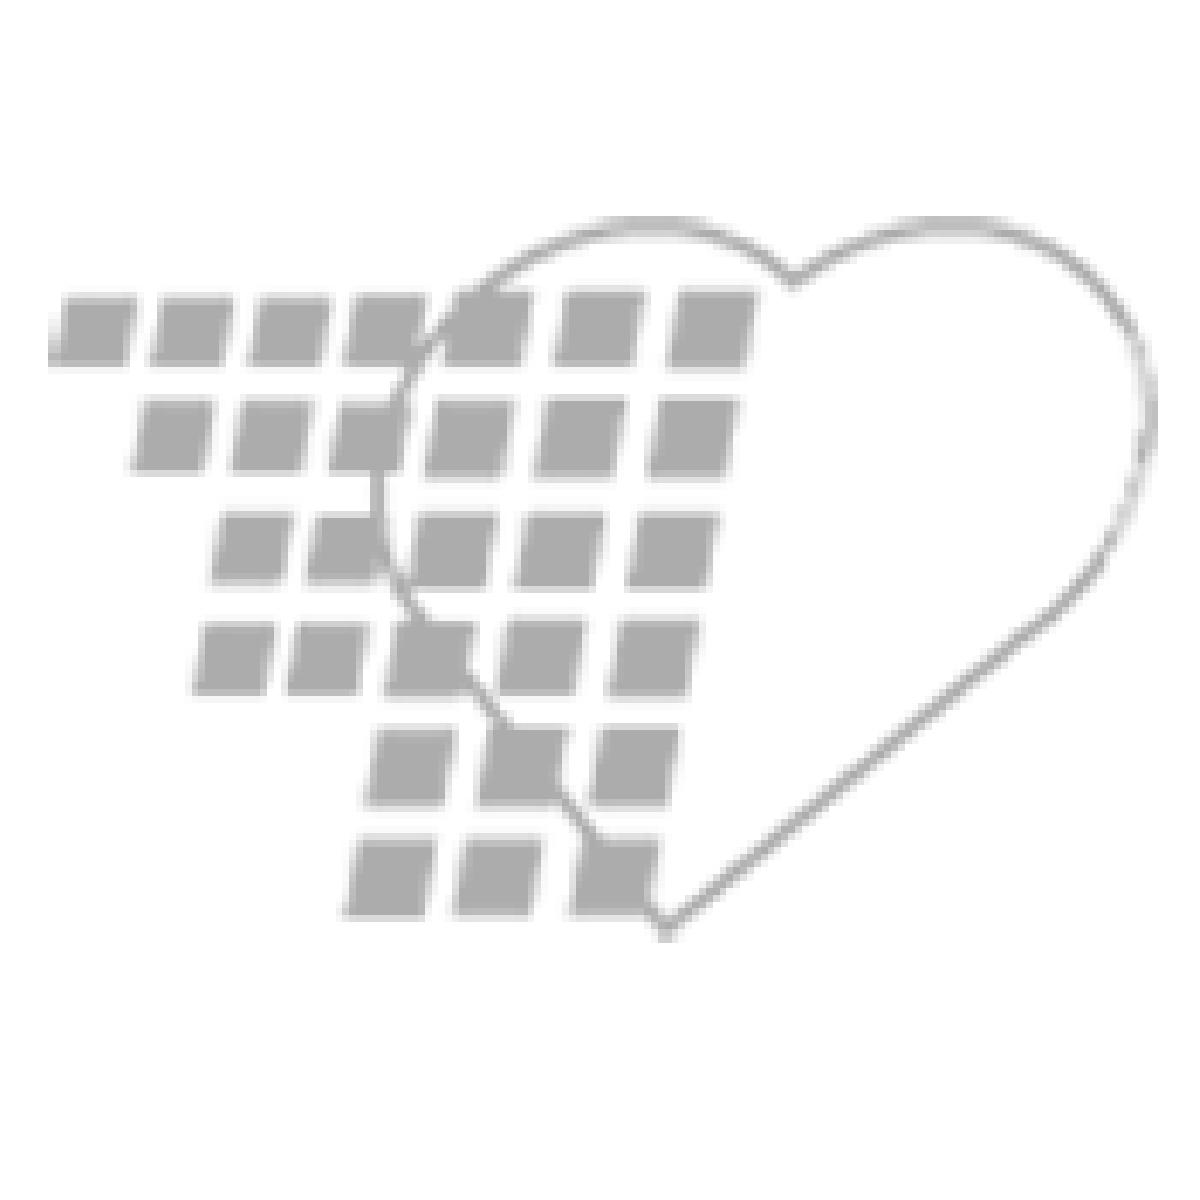 02-70-4000 ADC Macintosh Laryngoscope Blade, Disposable Fiber Optic